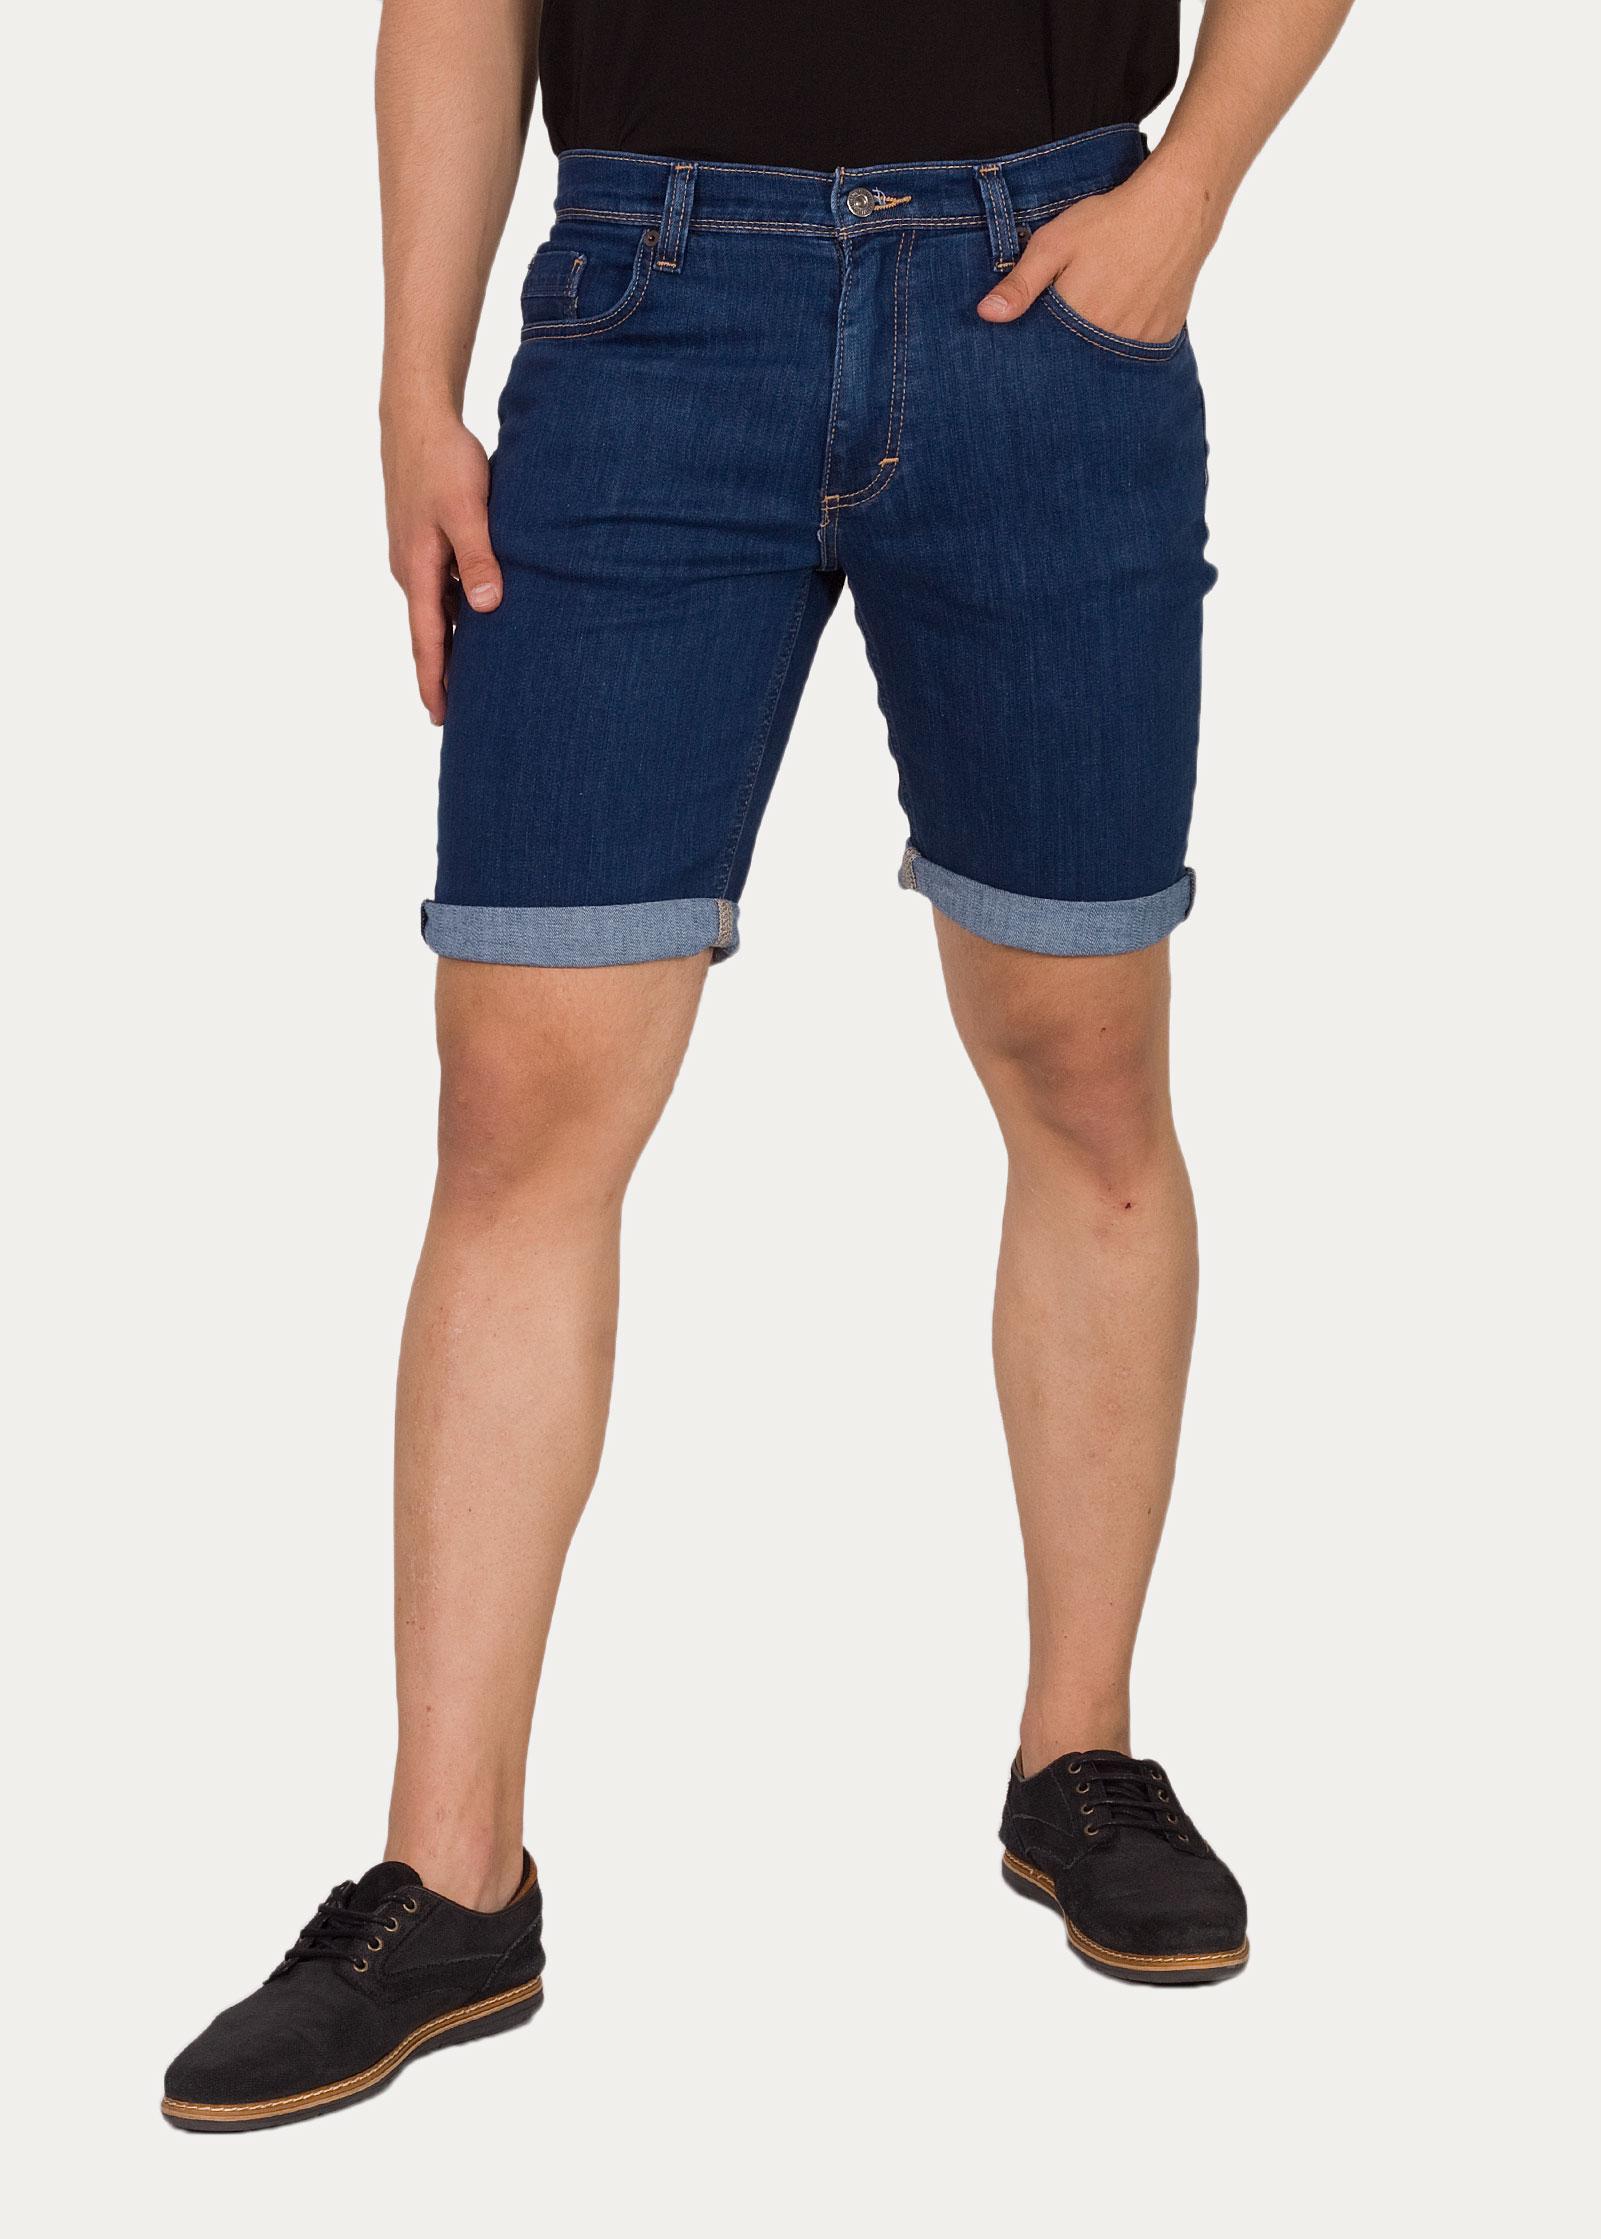 Men's Short Mustang® Washington Shorts - Denim Blue 1009588-5000-410 / Blue